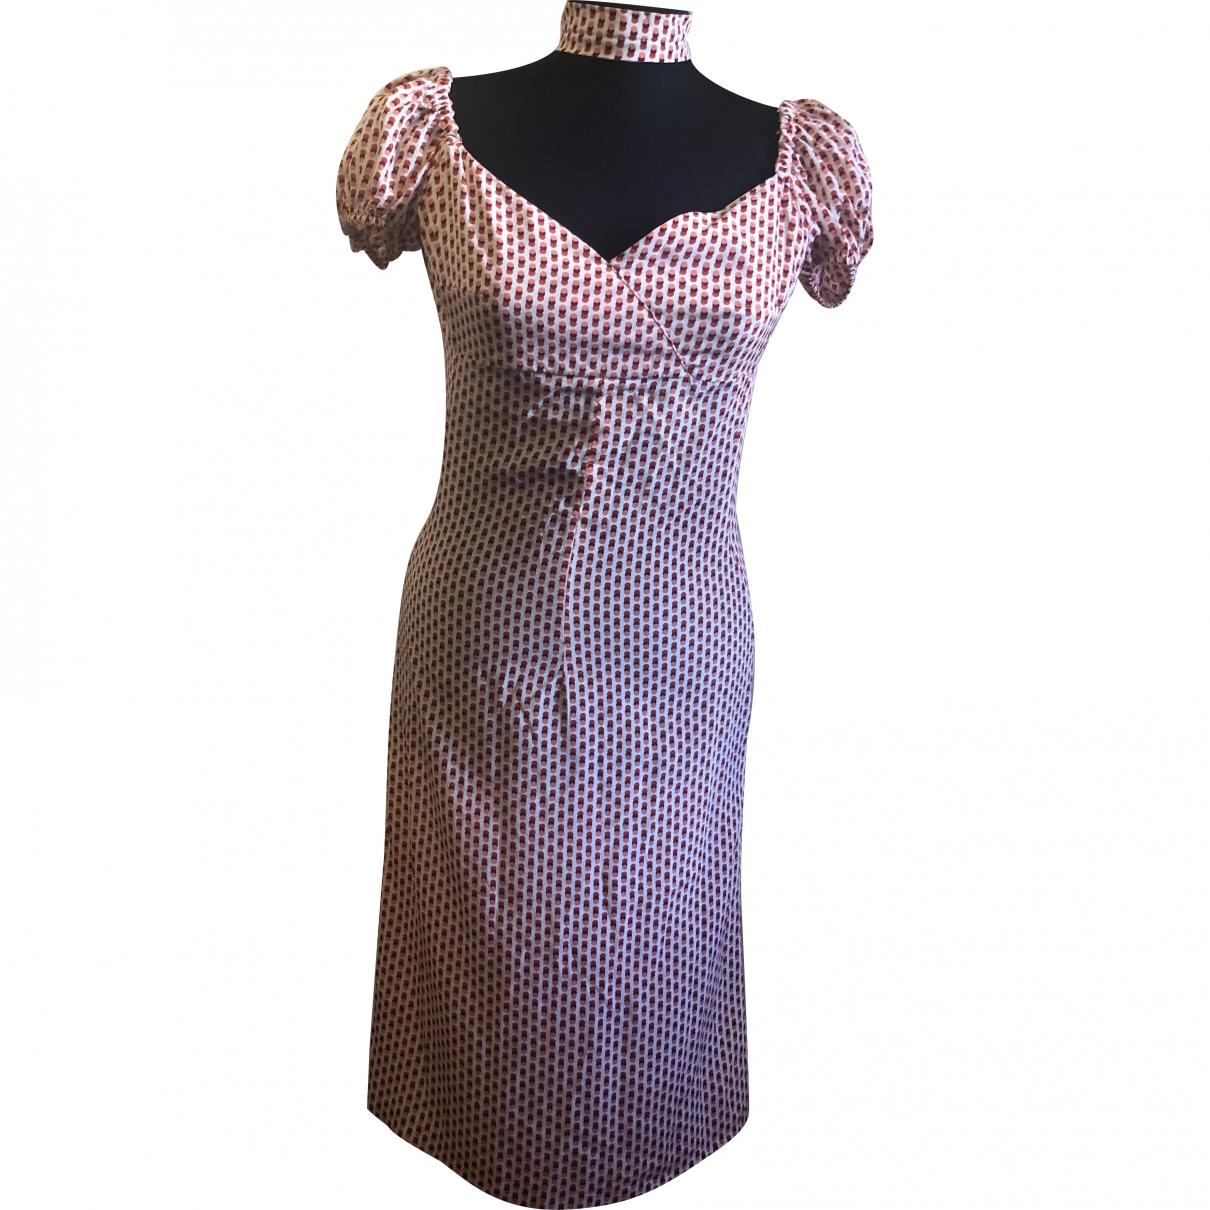 Alexis \N Silk dress for Women M International